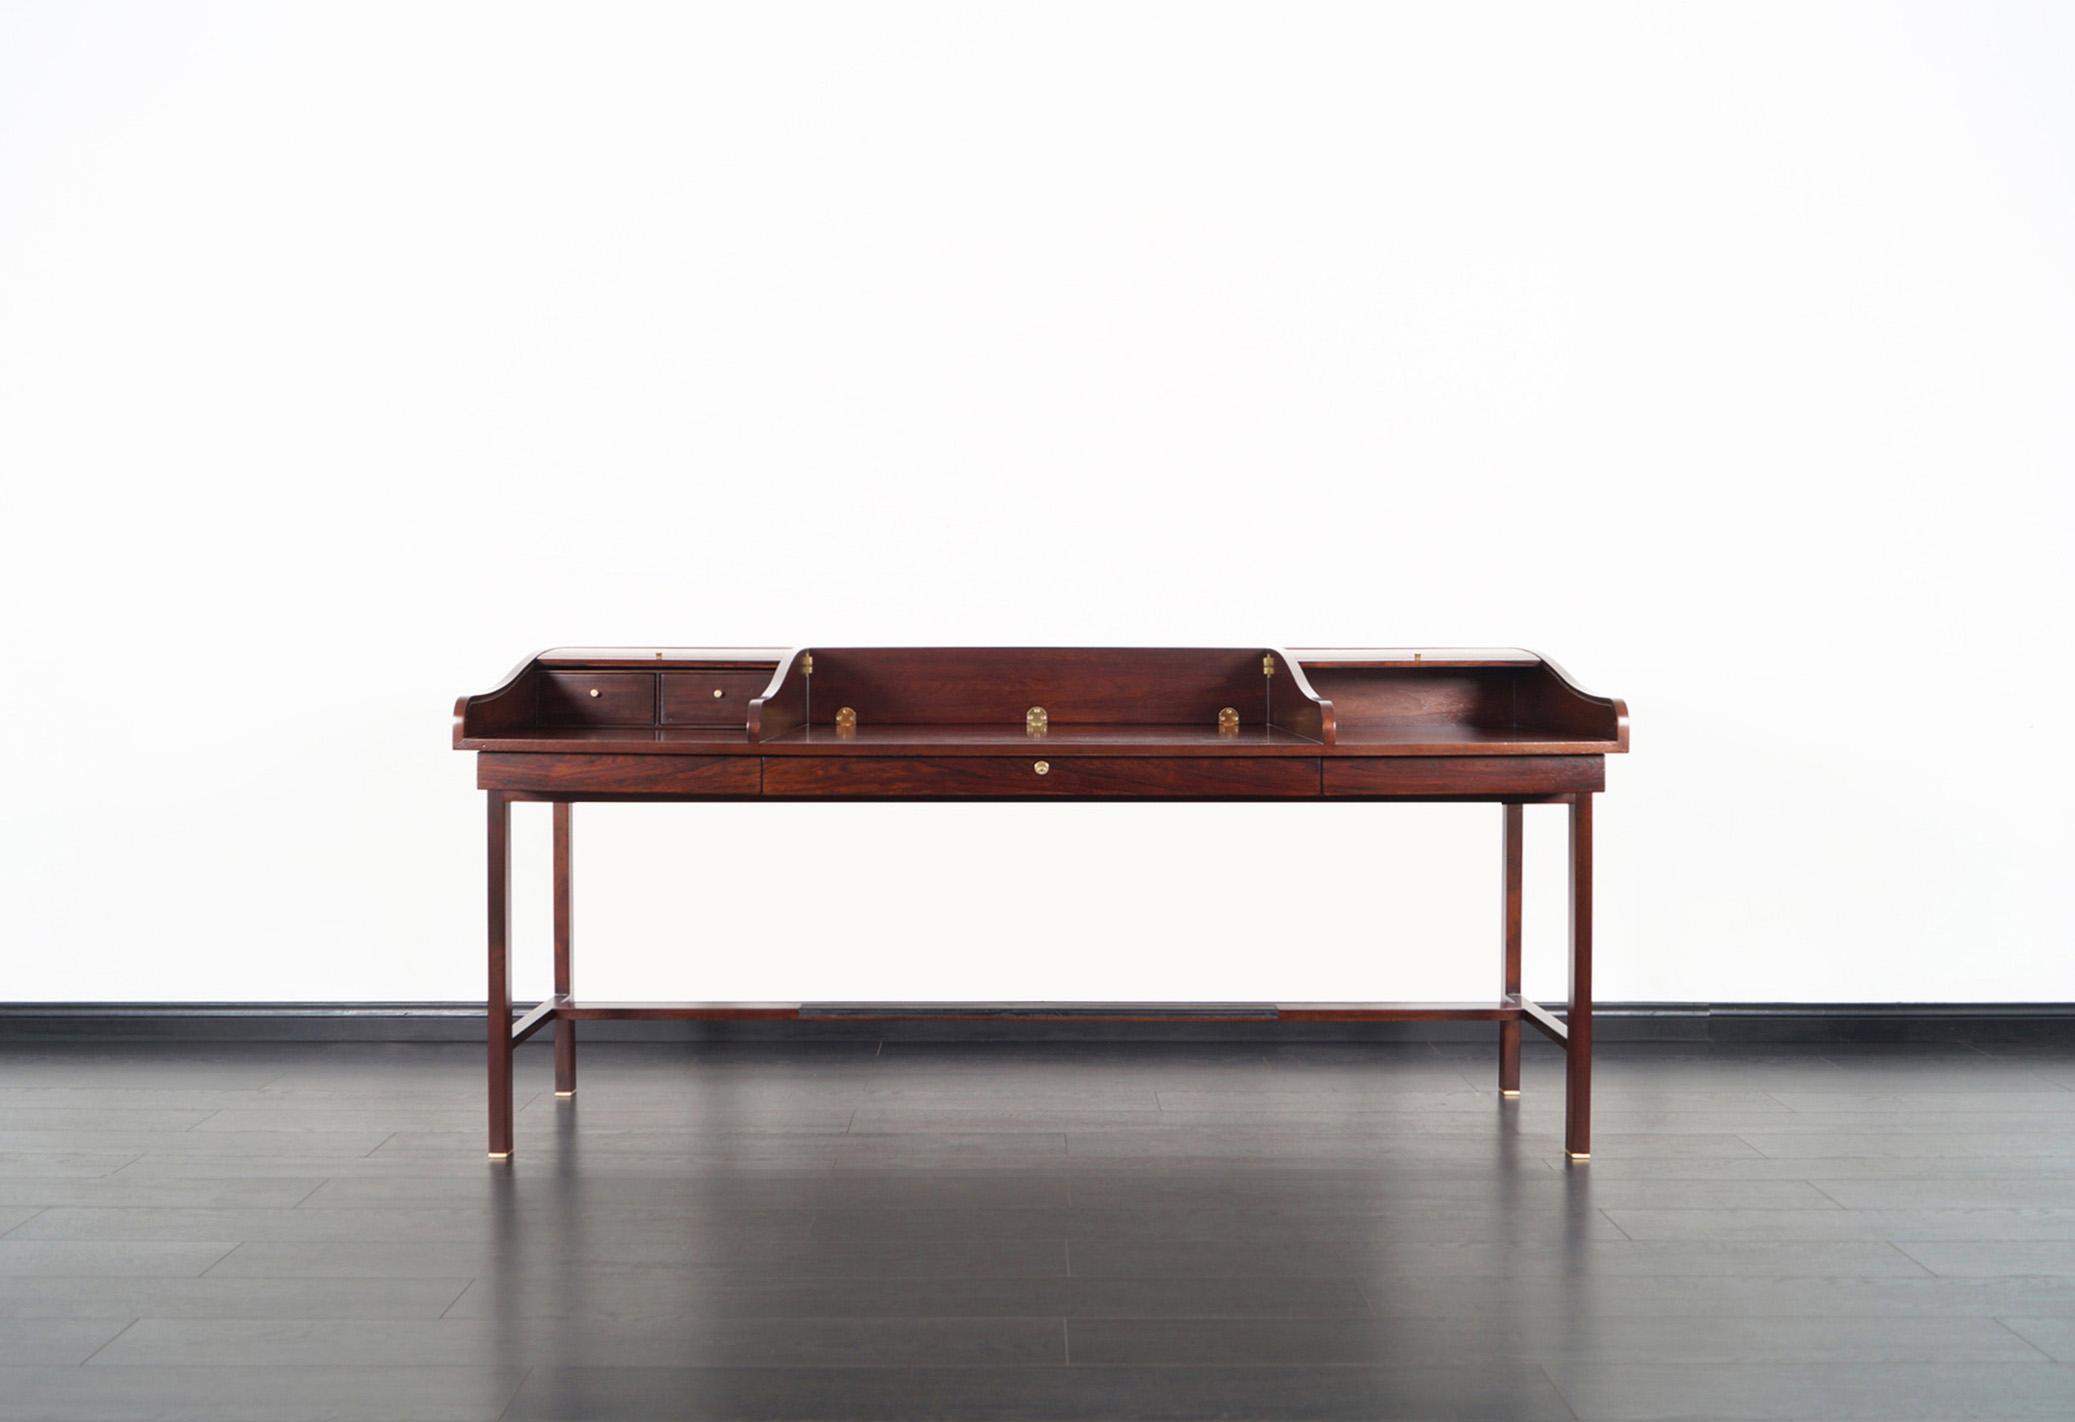 Executive Rosewood Tambour Doors Desk Model #452 by Edward J. Wormley